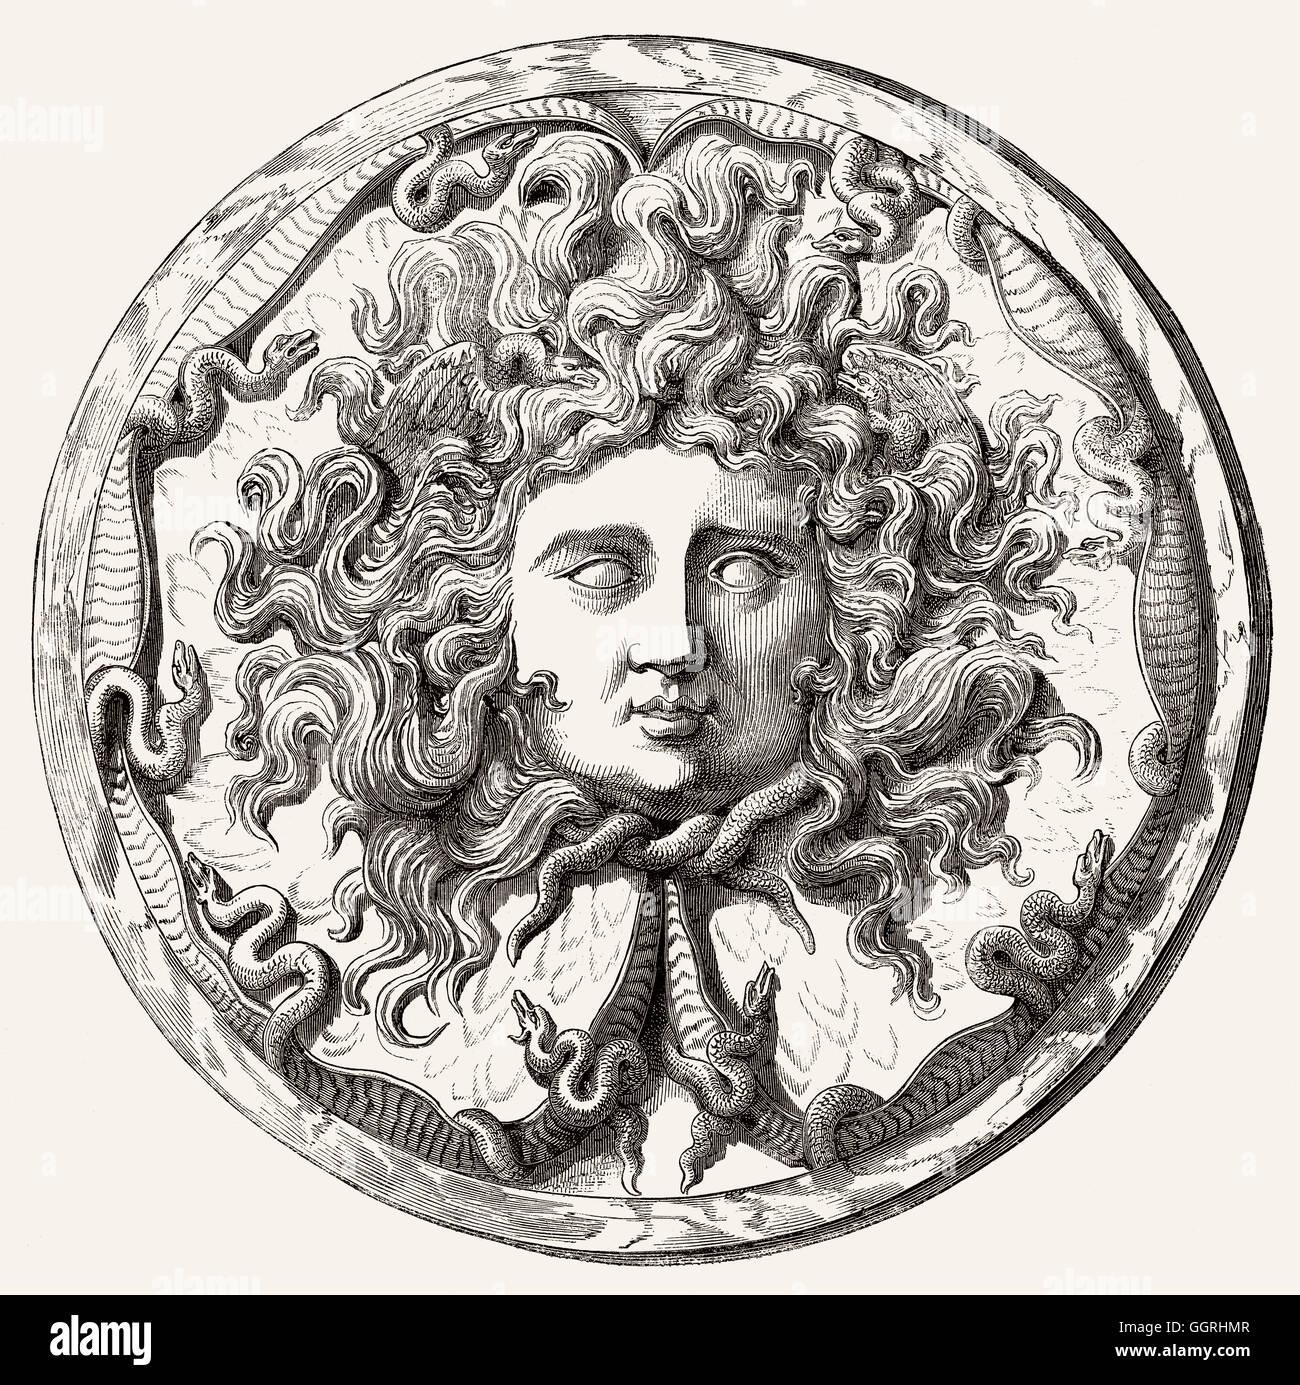 medusa mythologie